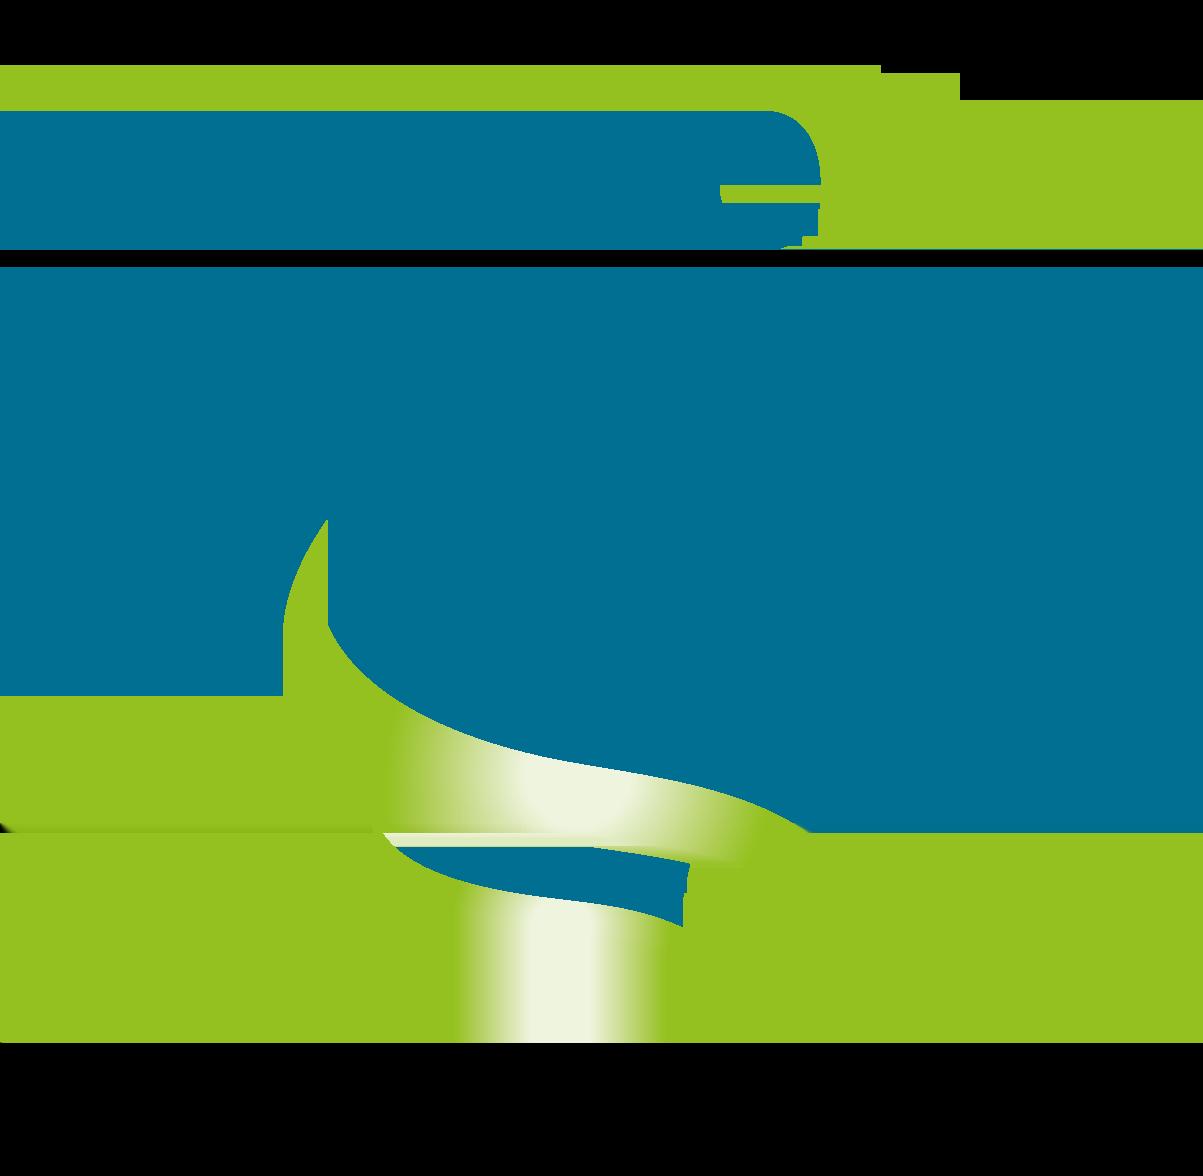 MoveItLogo1 (3)